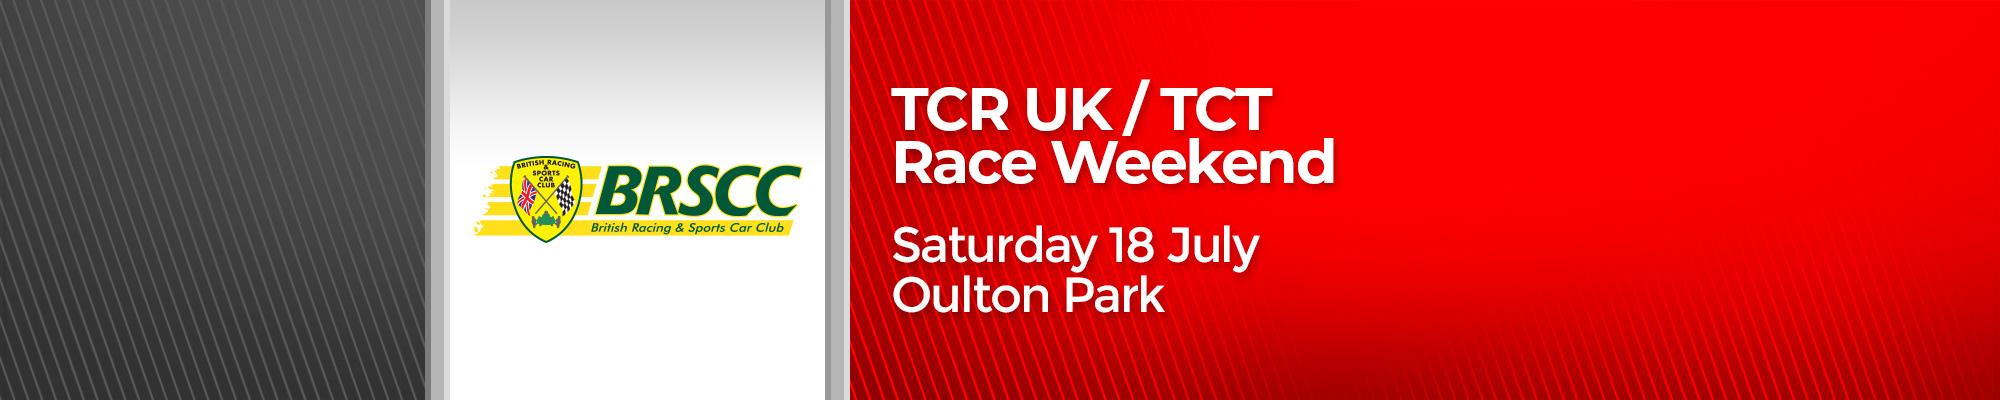 TCR UK & TCT Race Day (BRSCC)